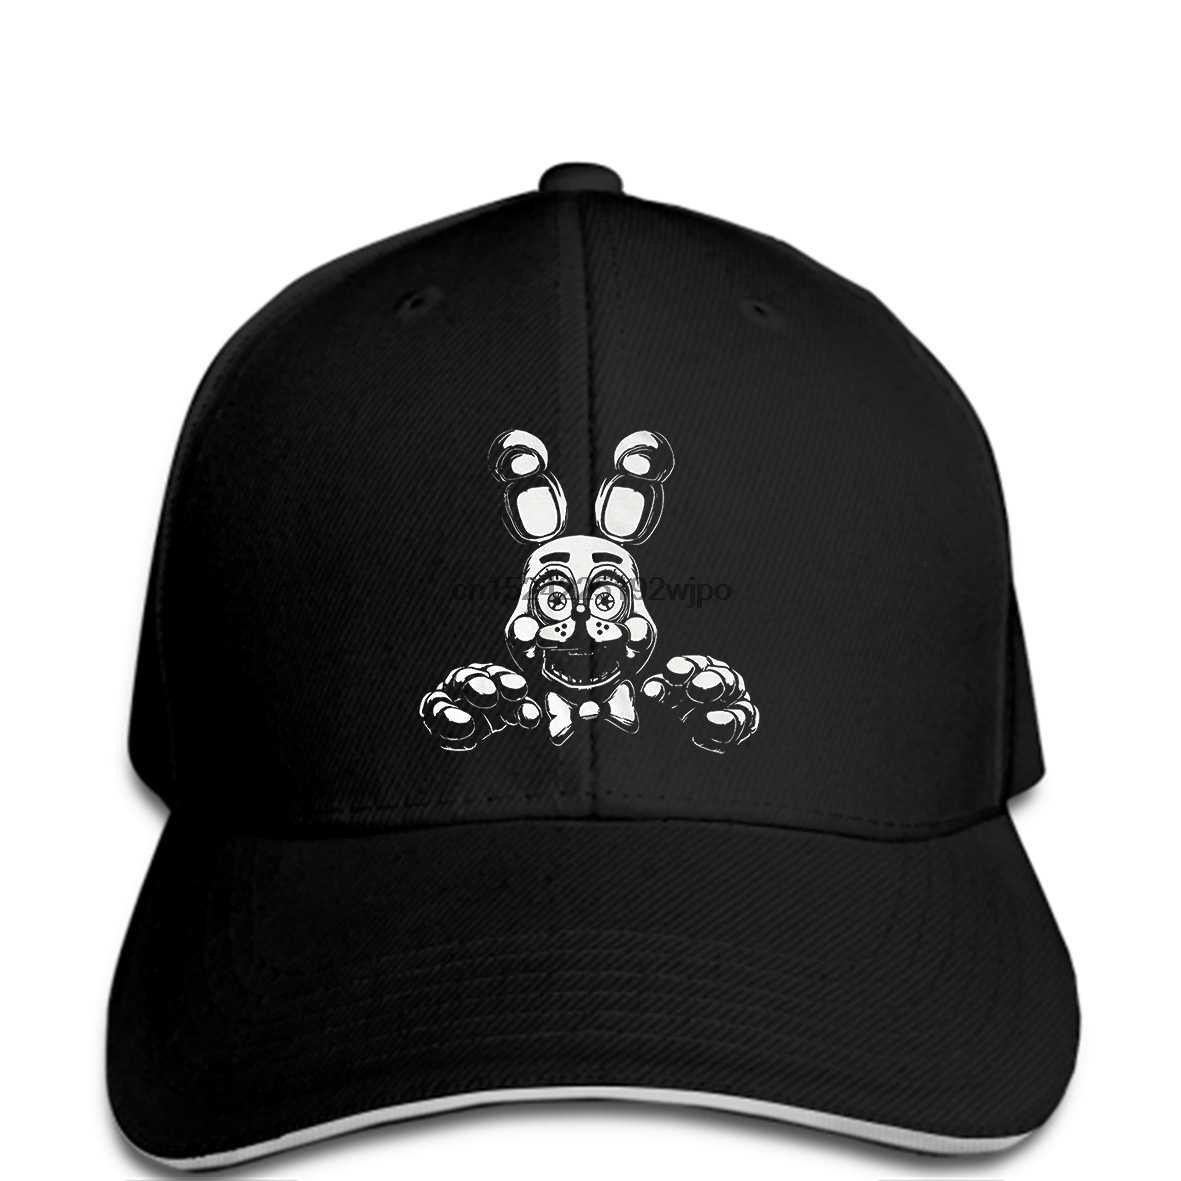 dc938d7b762f71 Detail Feedback Questions about funny Baseball caps Bonnie FNAF cap ...